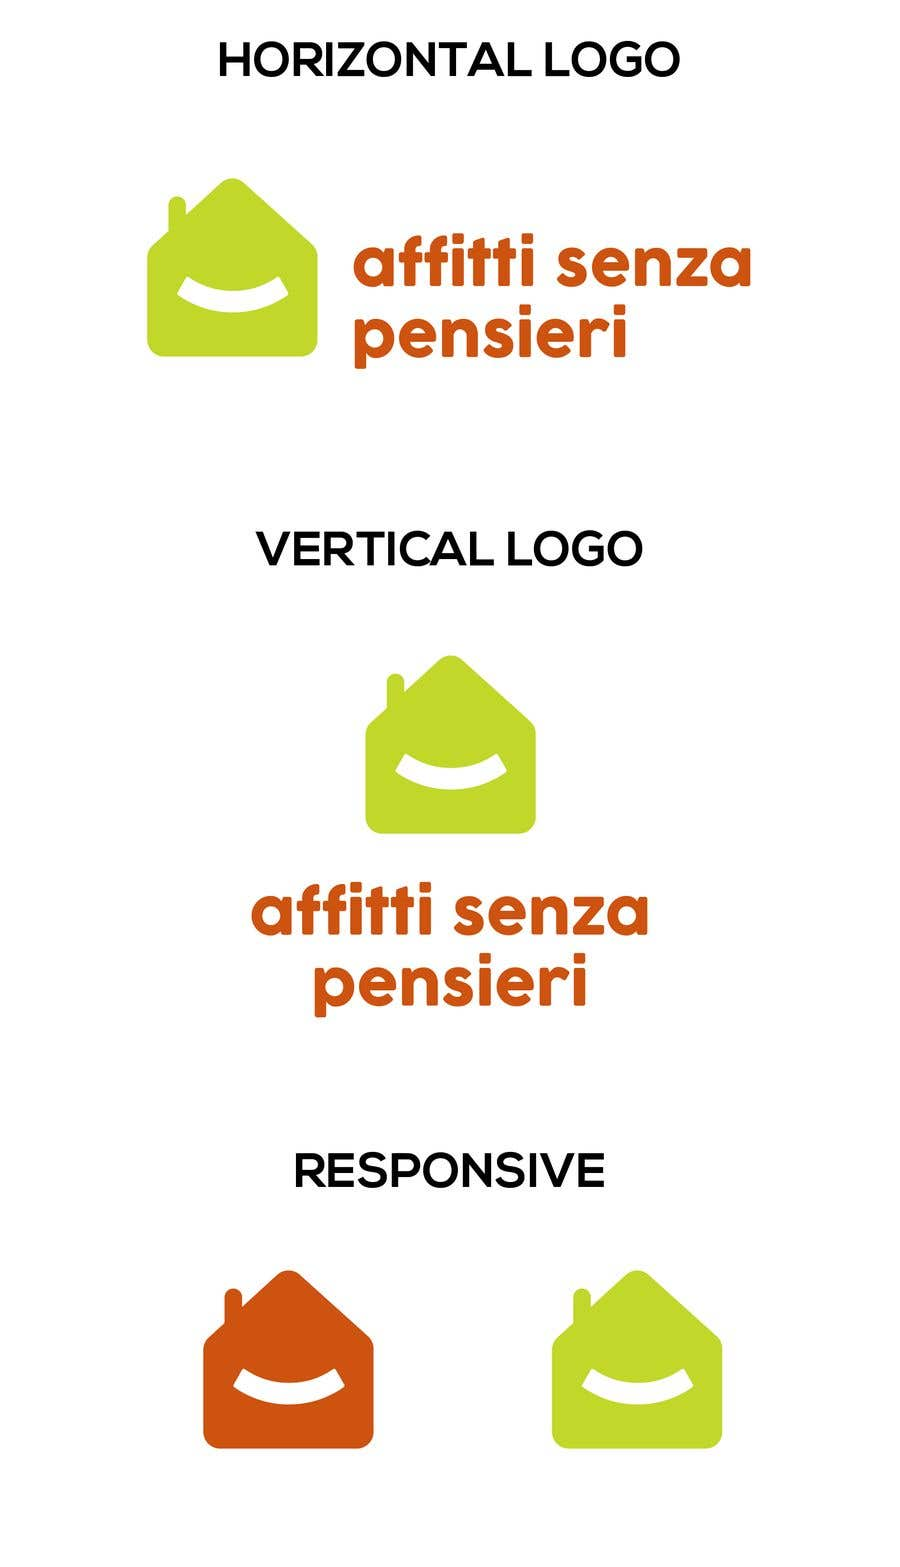 Kilpailutyö #1 kilpailussa Progettare un logo